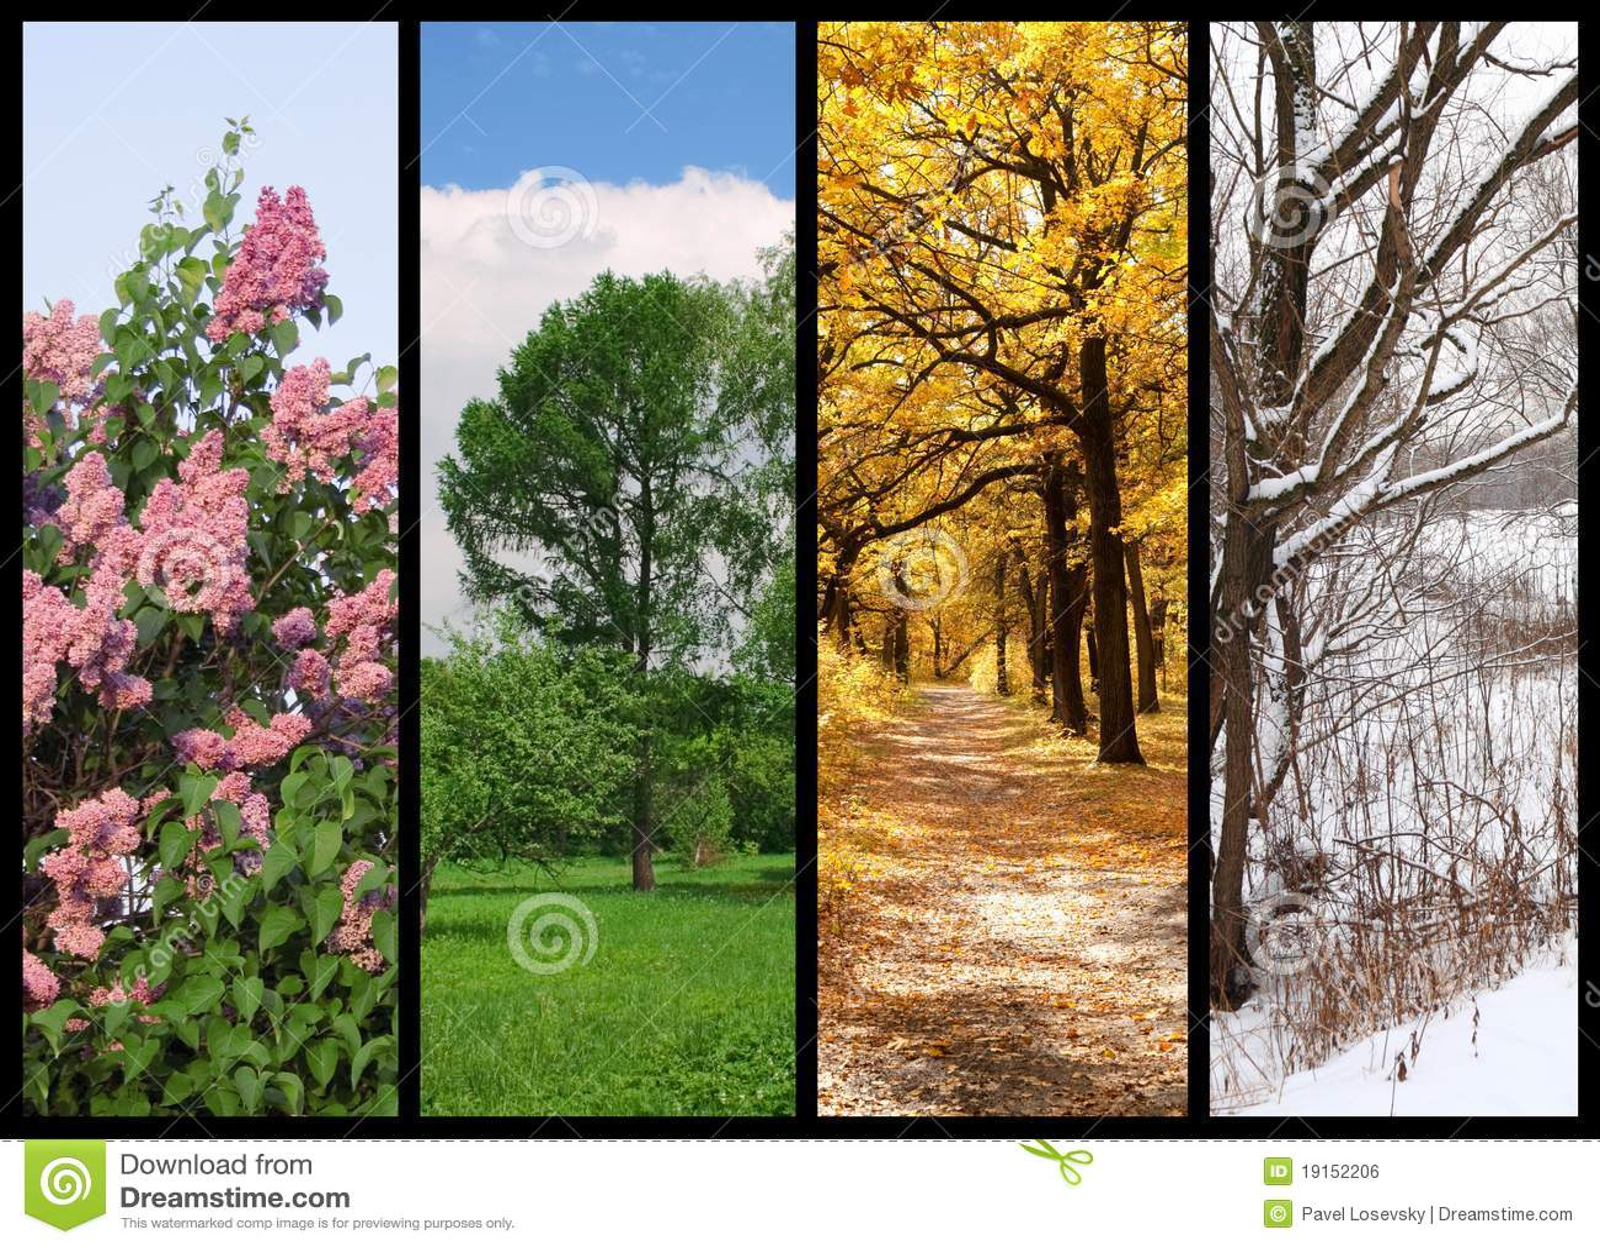 Four seasons spring, summer, autumn, winter